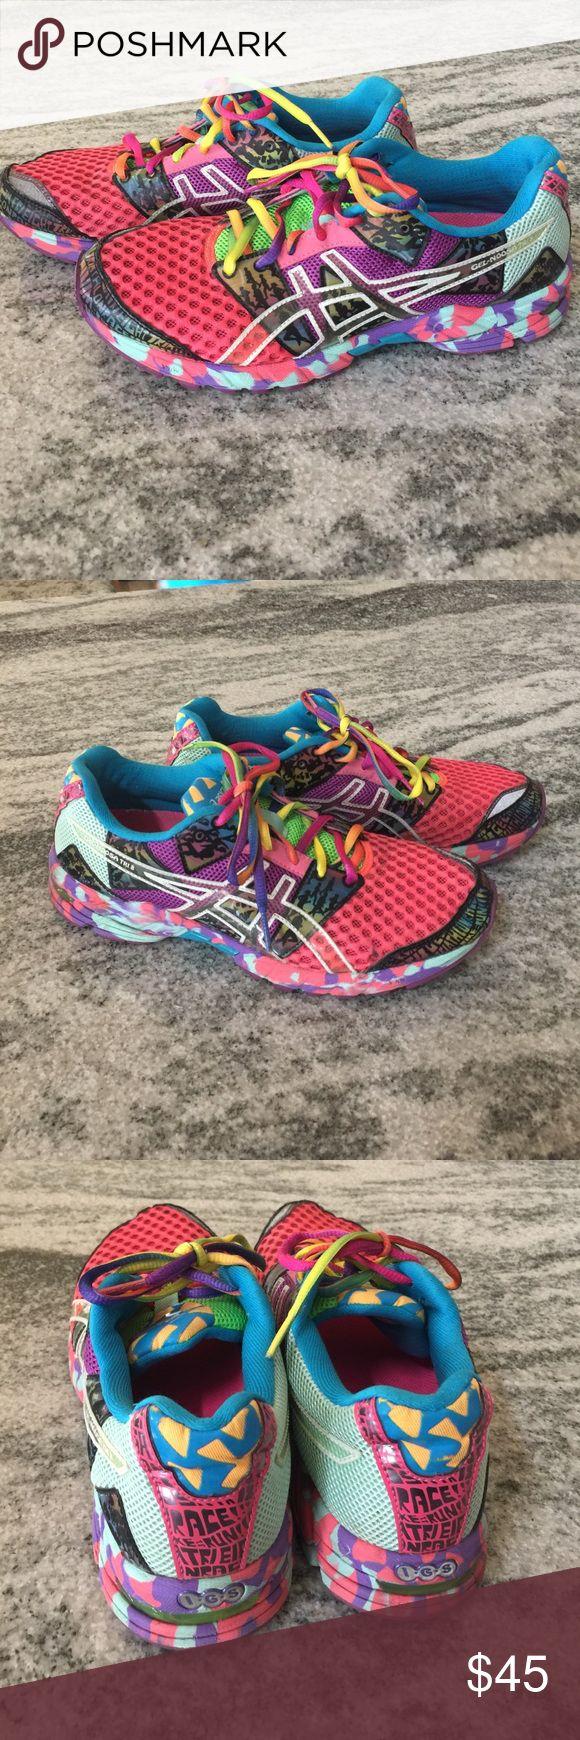 Asics gel noosa tri 8 Asics gel noosa tri 8 good condition Asics Shoes Athletic Shoes